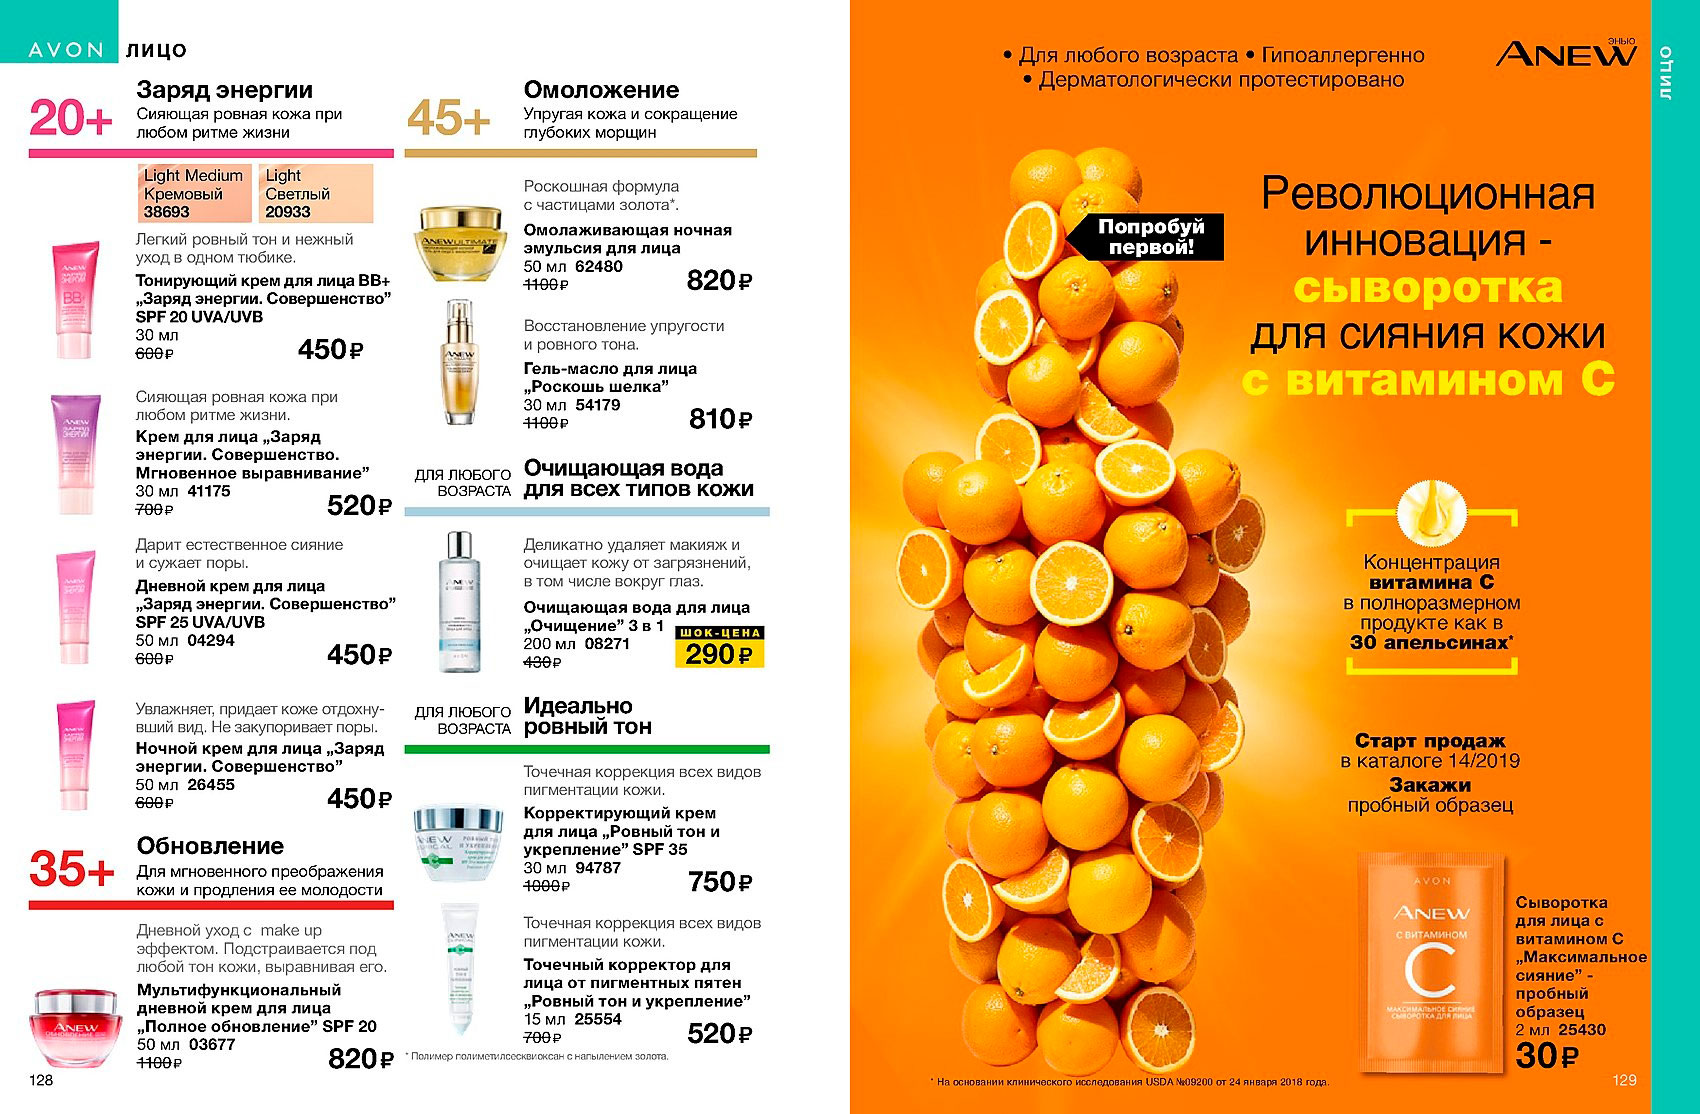 Avon katalog 13 2013 netto купить косметику биодерма в перми